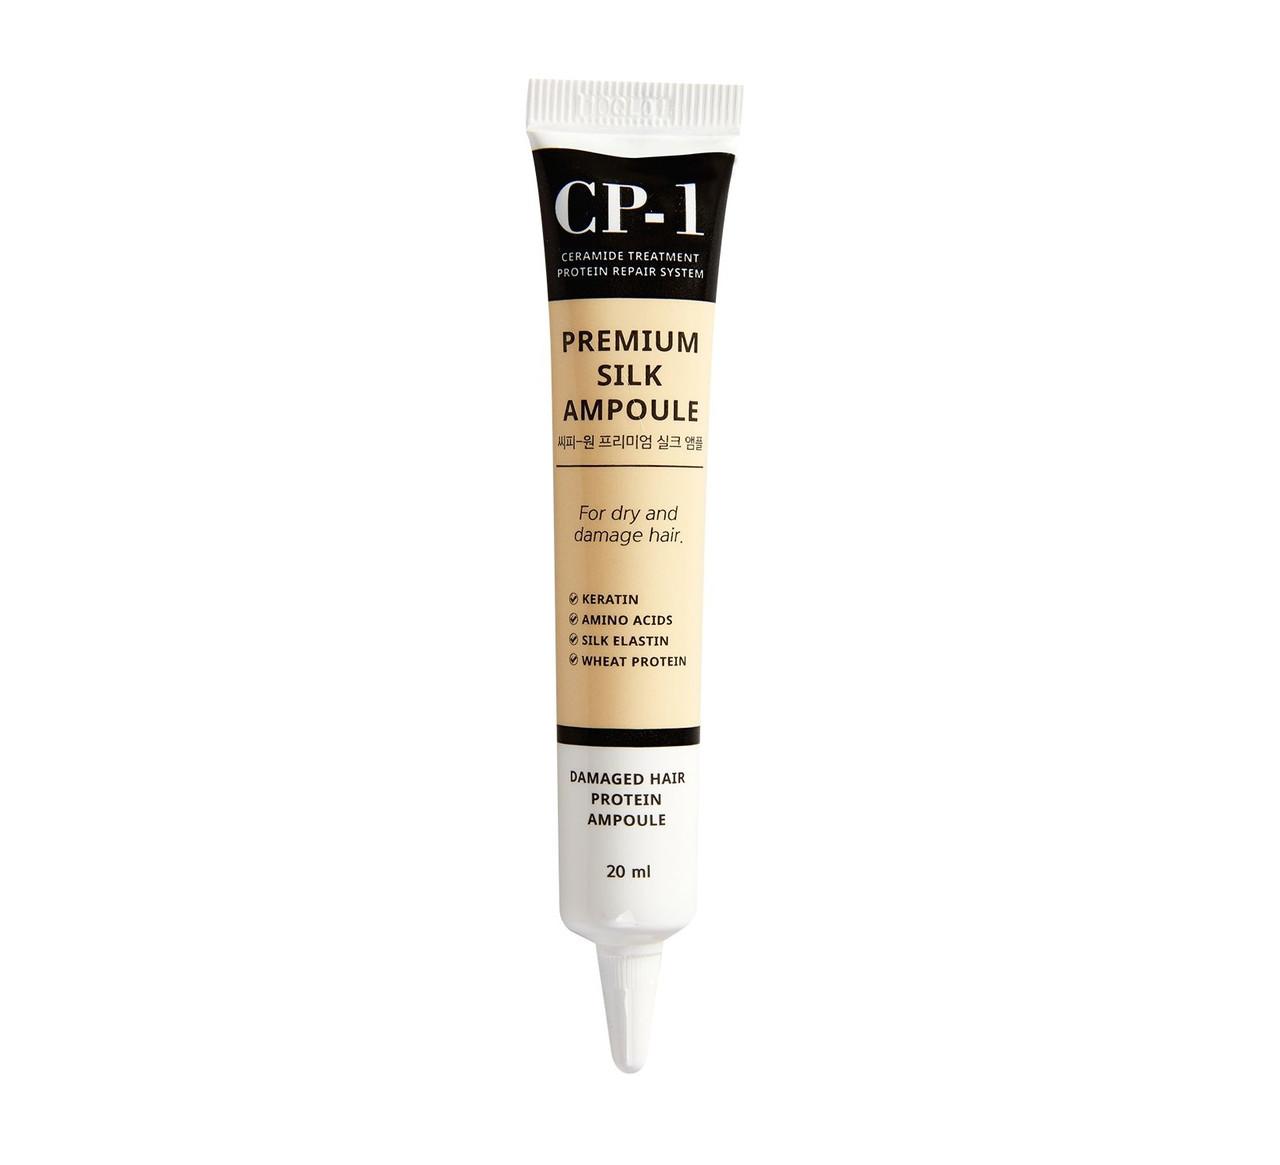 CP-1 Premium Silk Ampoule Восстанавливающая сыворотка для волос